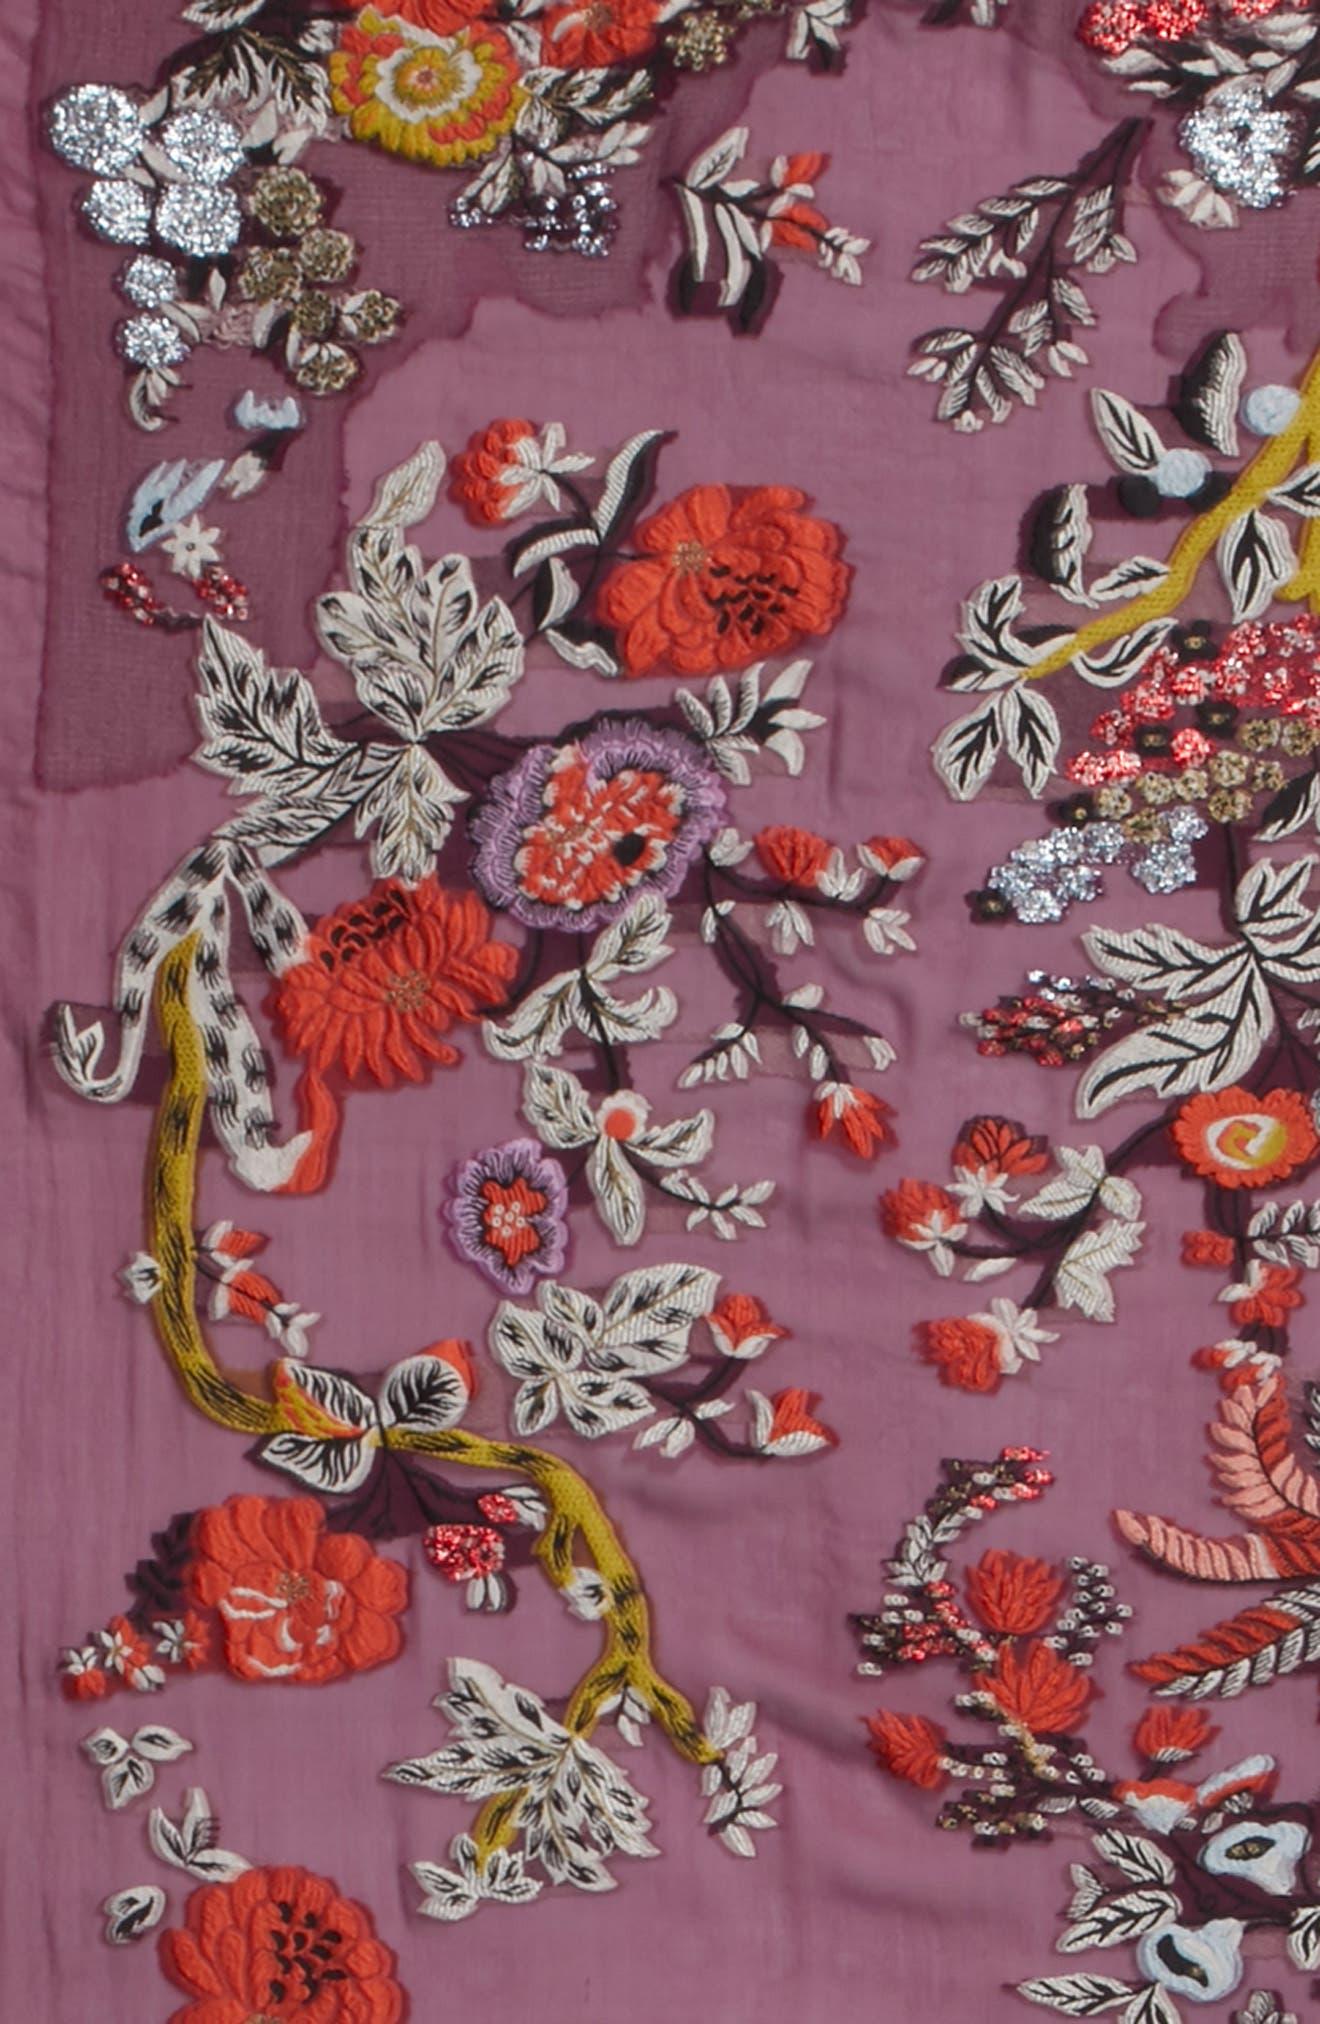 Maharaja Embroidered Wrap Scarf,                             Alternate thumbnail 4, color,                             PURPLE MULTI